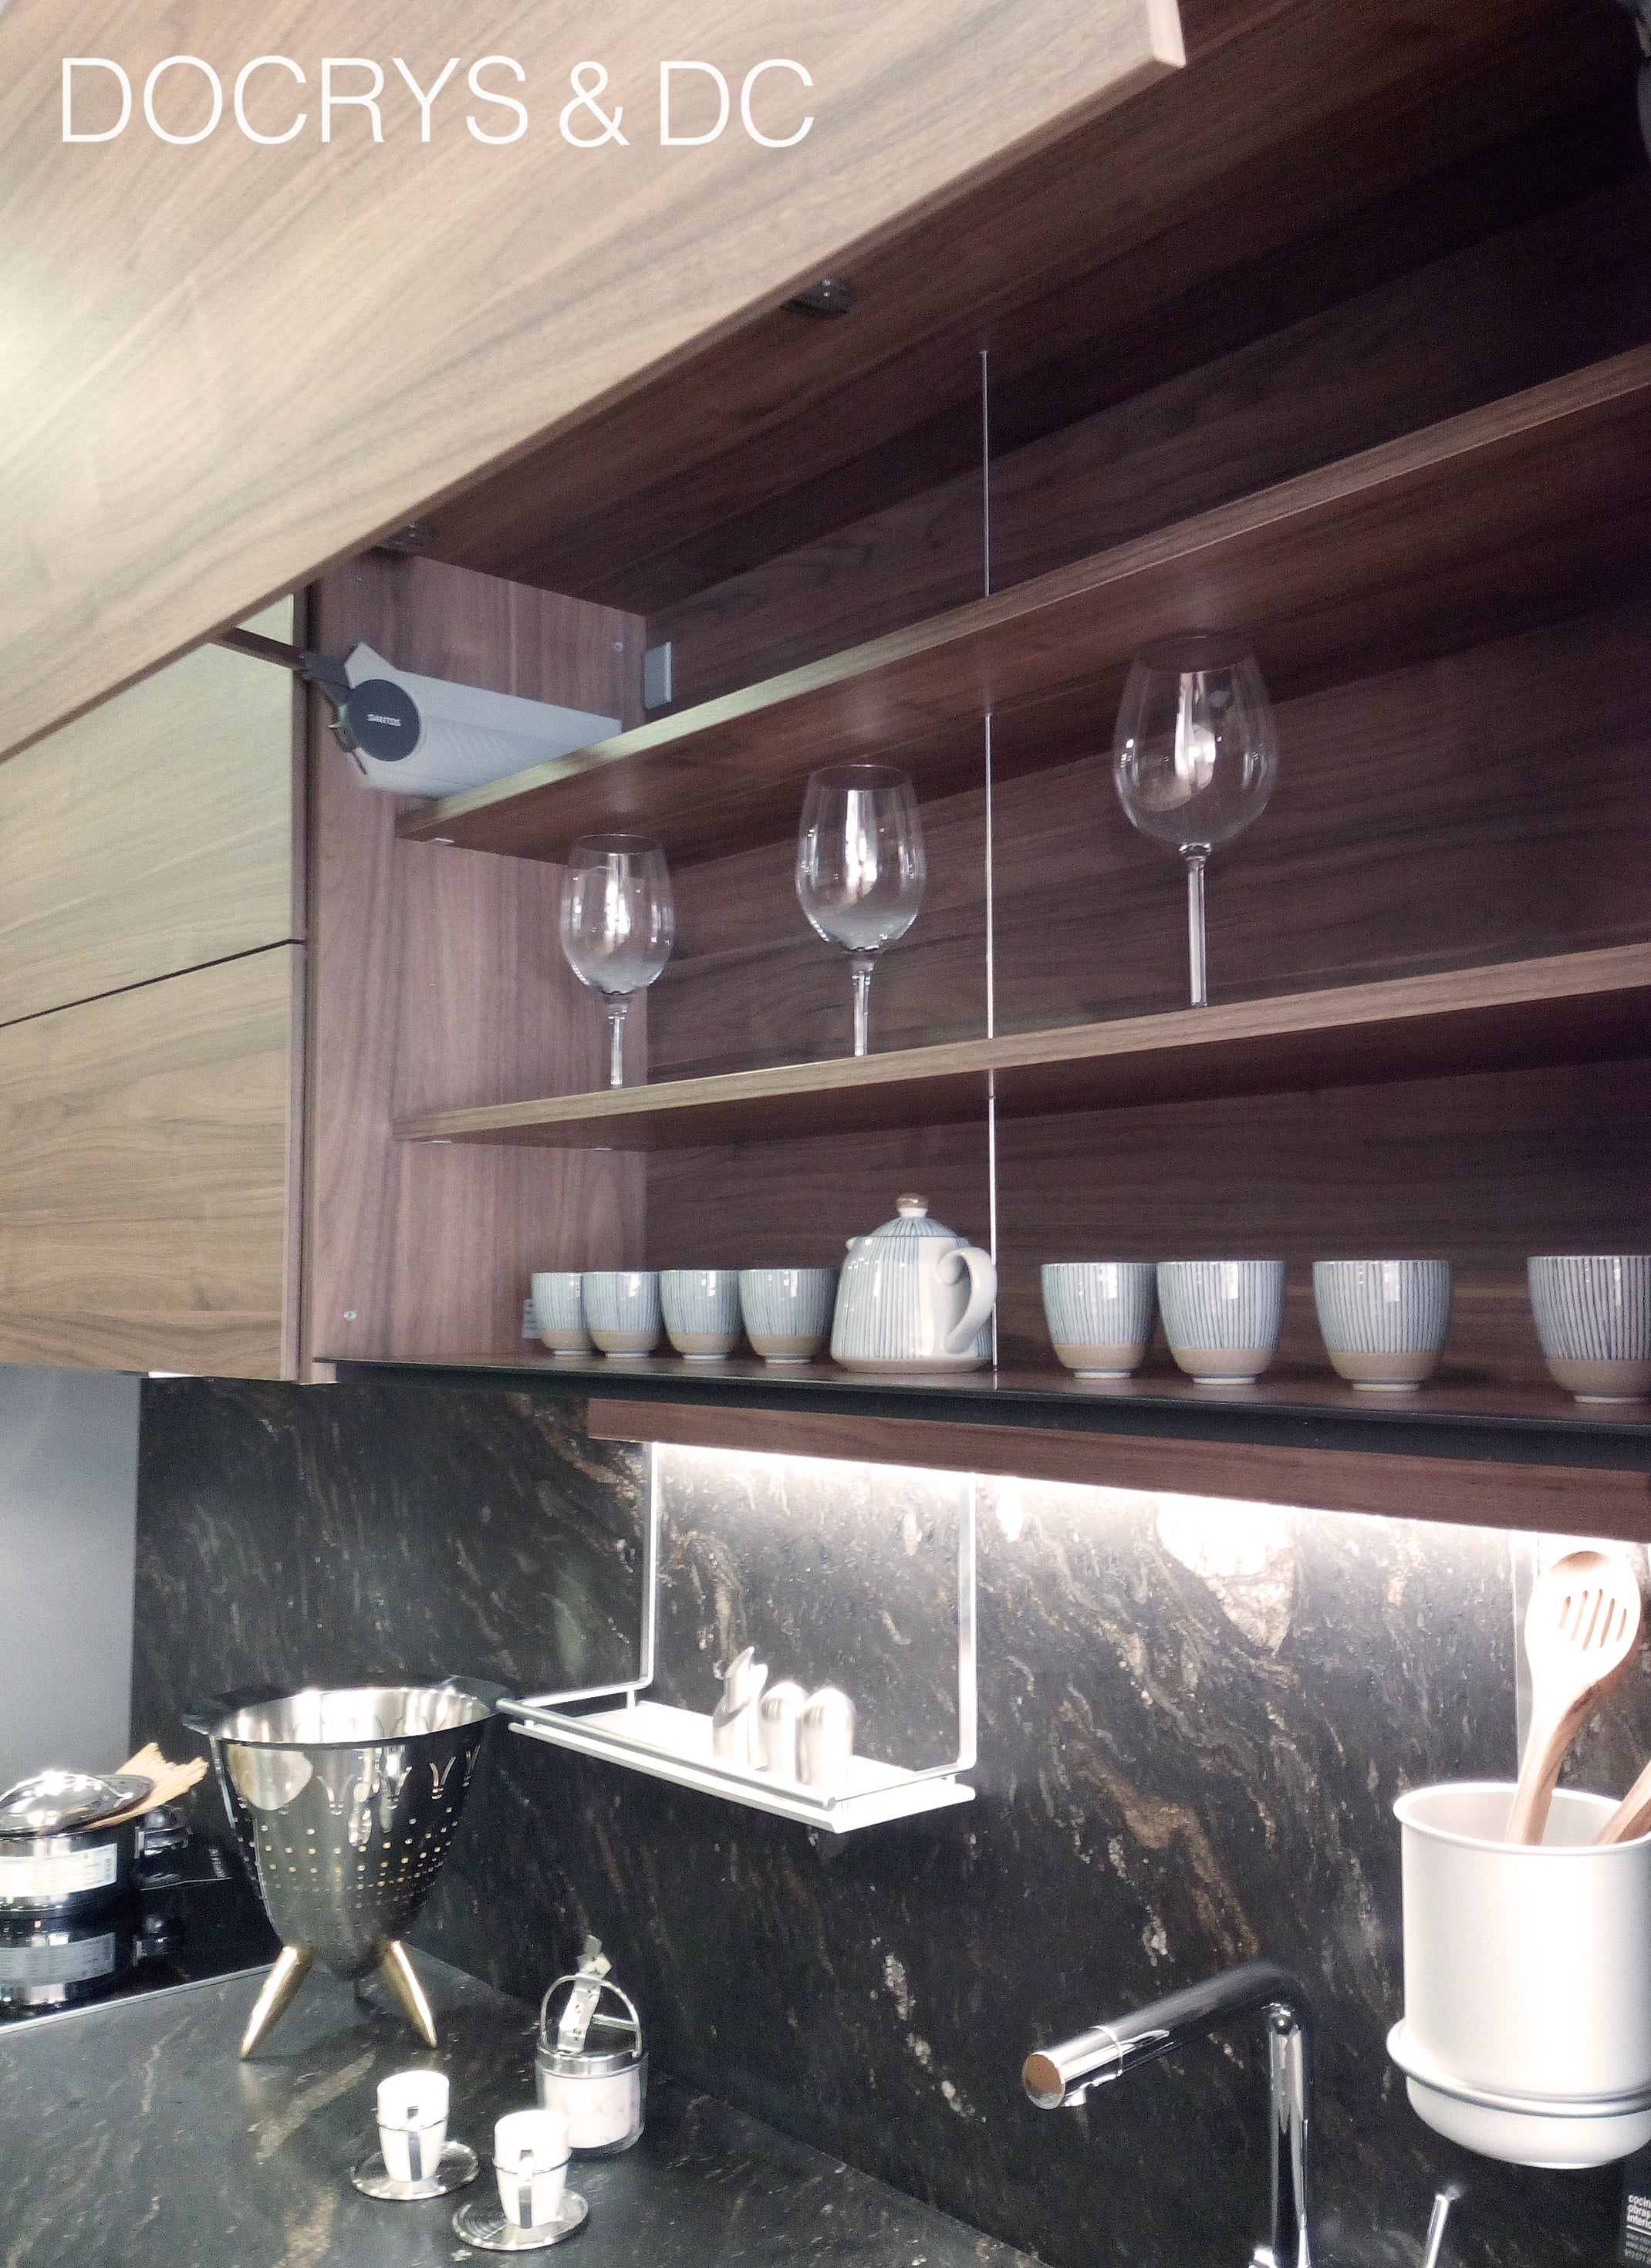 Cocina santos modelo fine lah docrys cocinas for Ofertas encimeras cocina